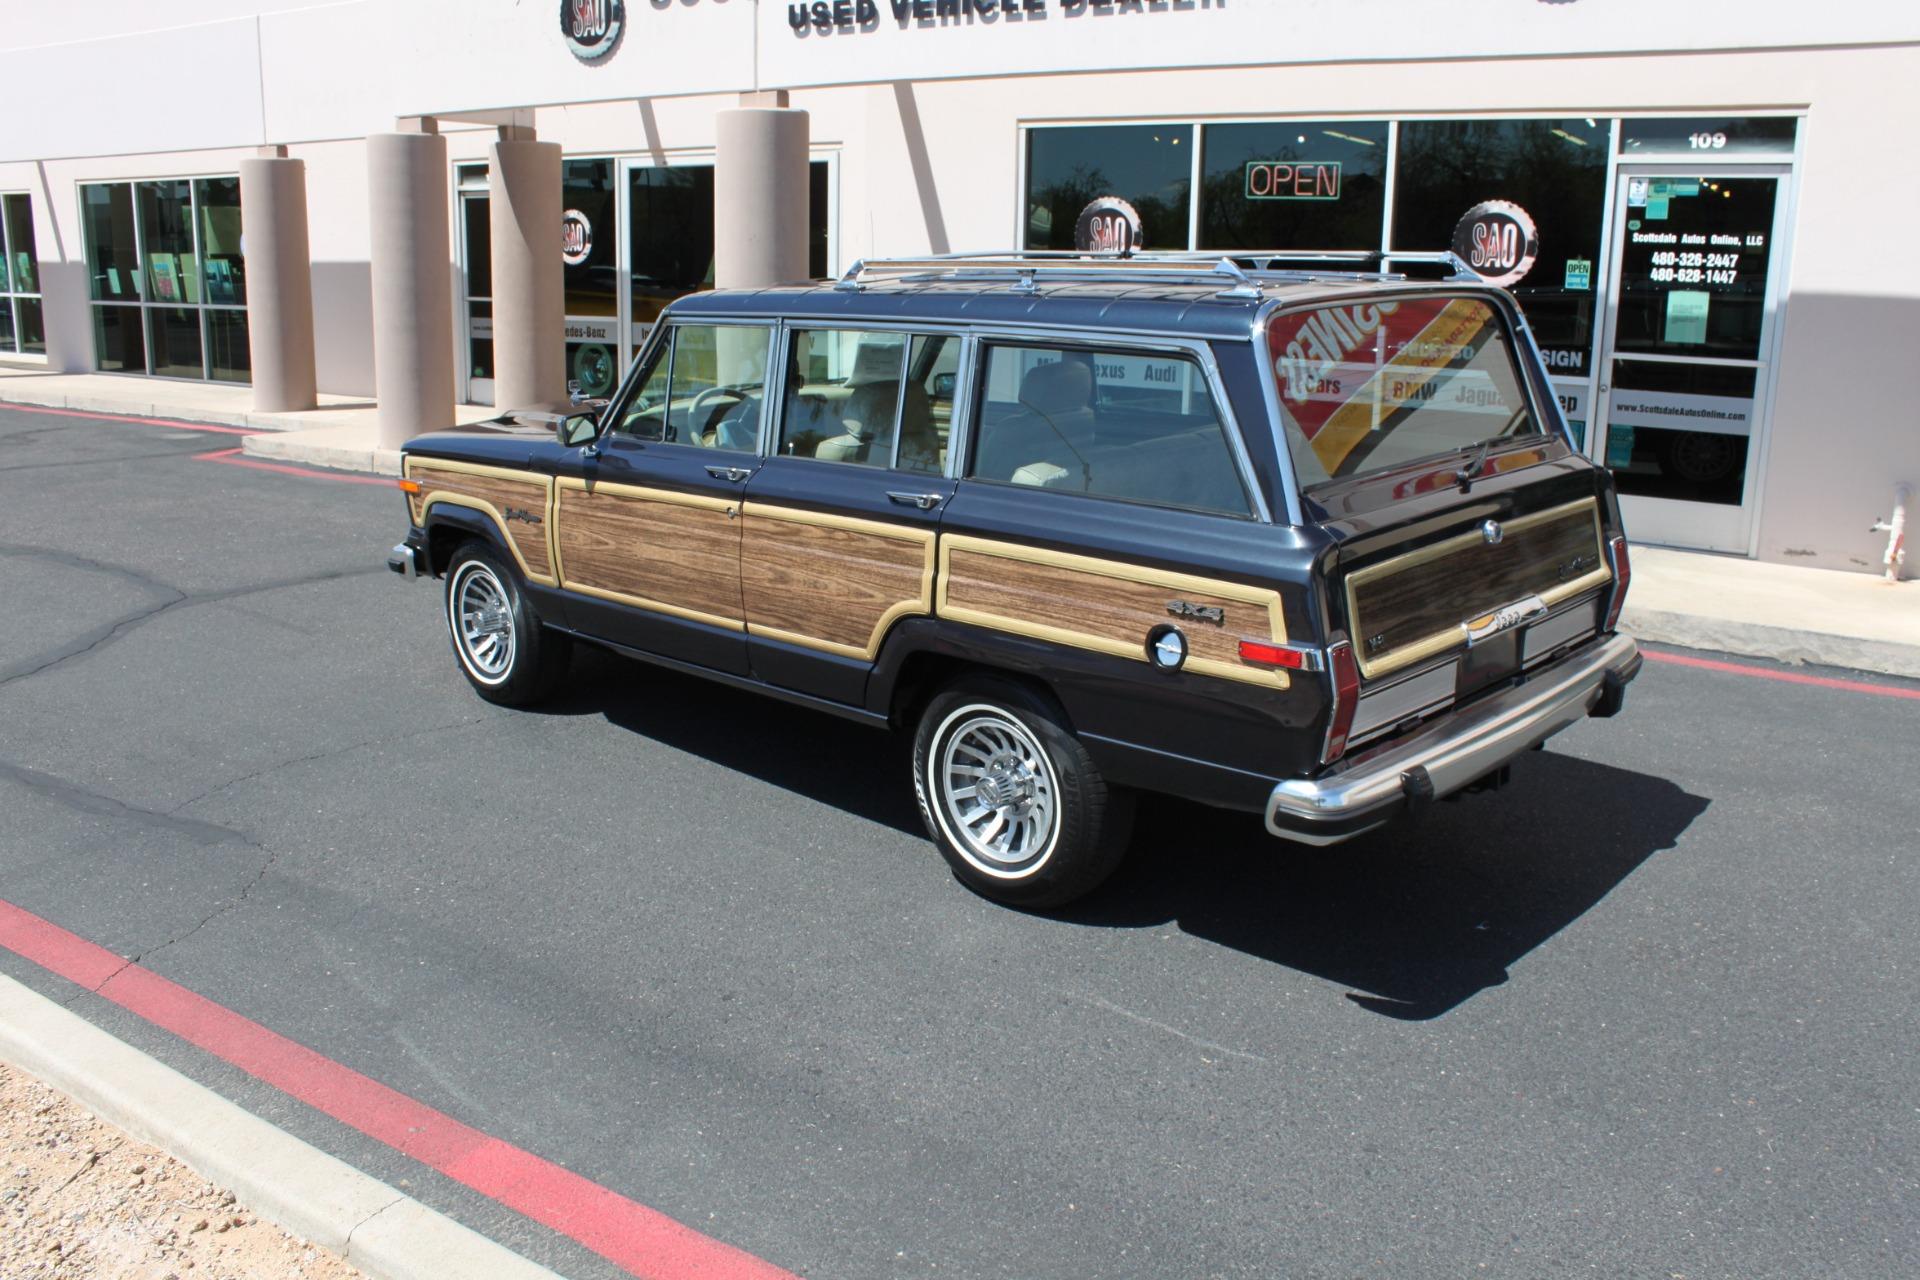 Used-1991-Jeep-Grand-Wagoneer-4X4-Fiat